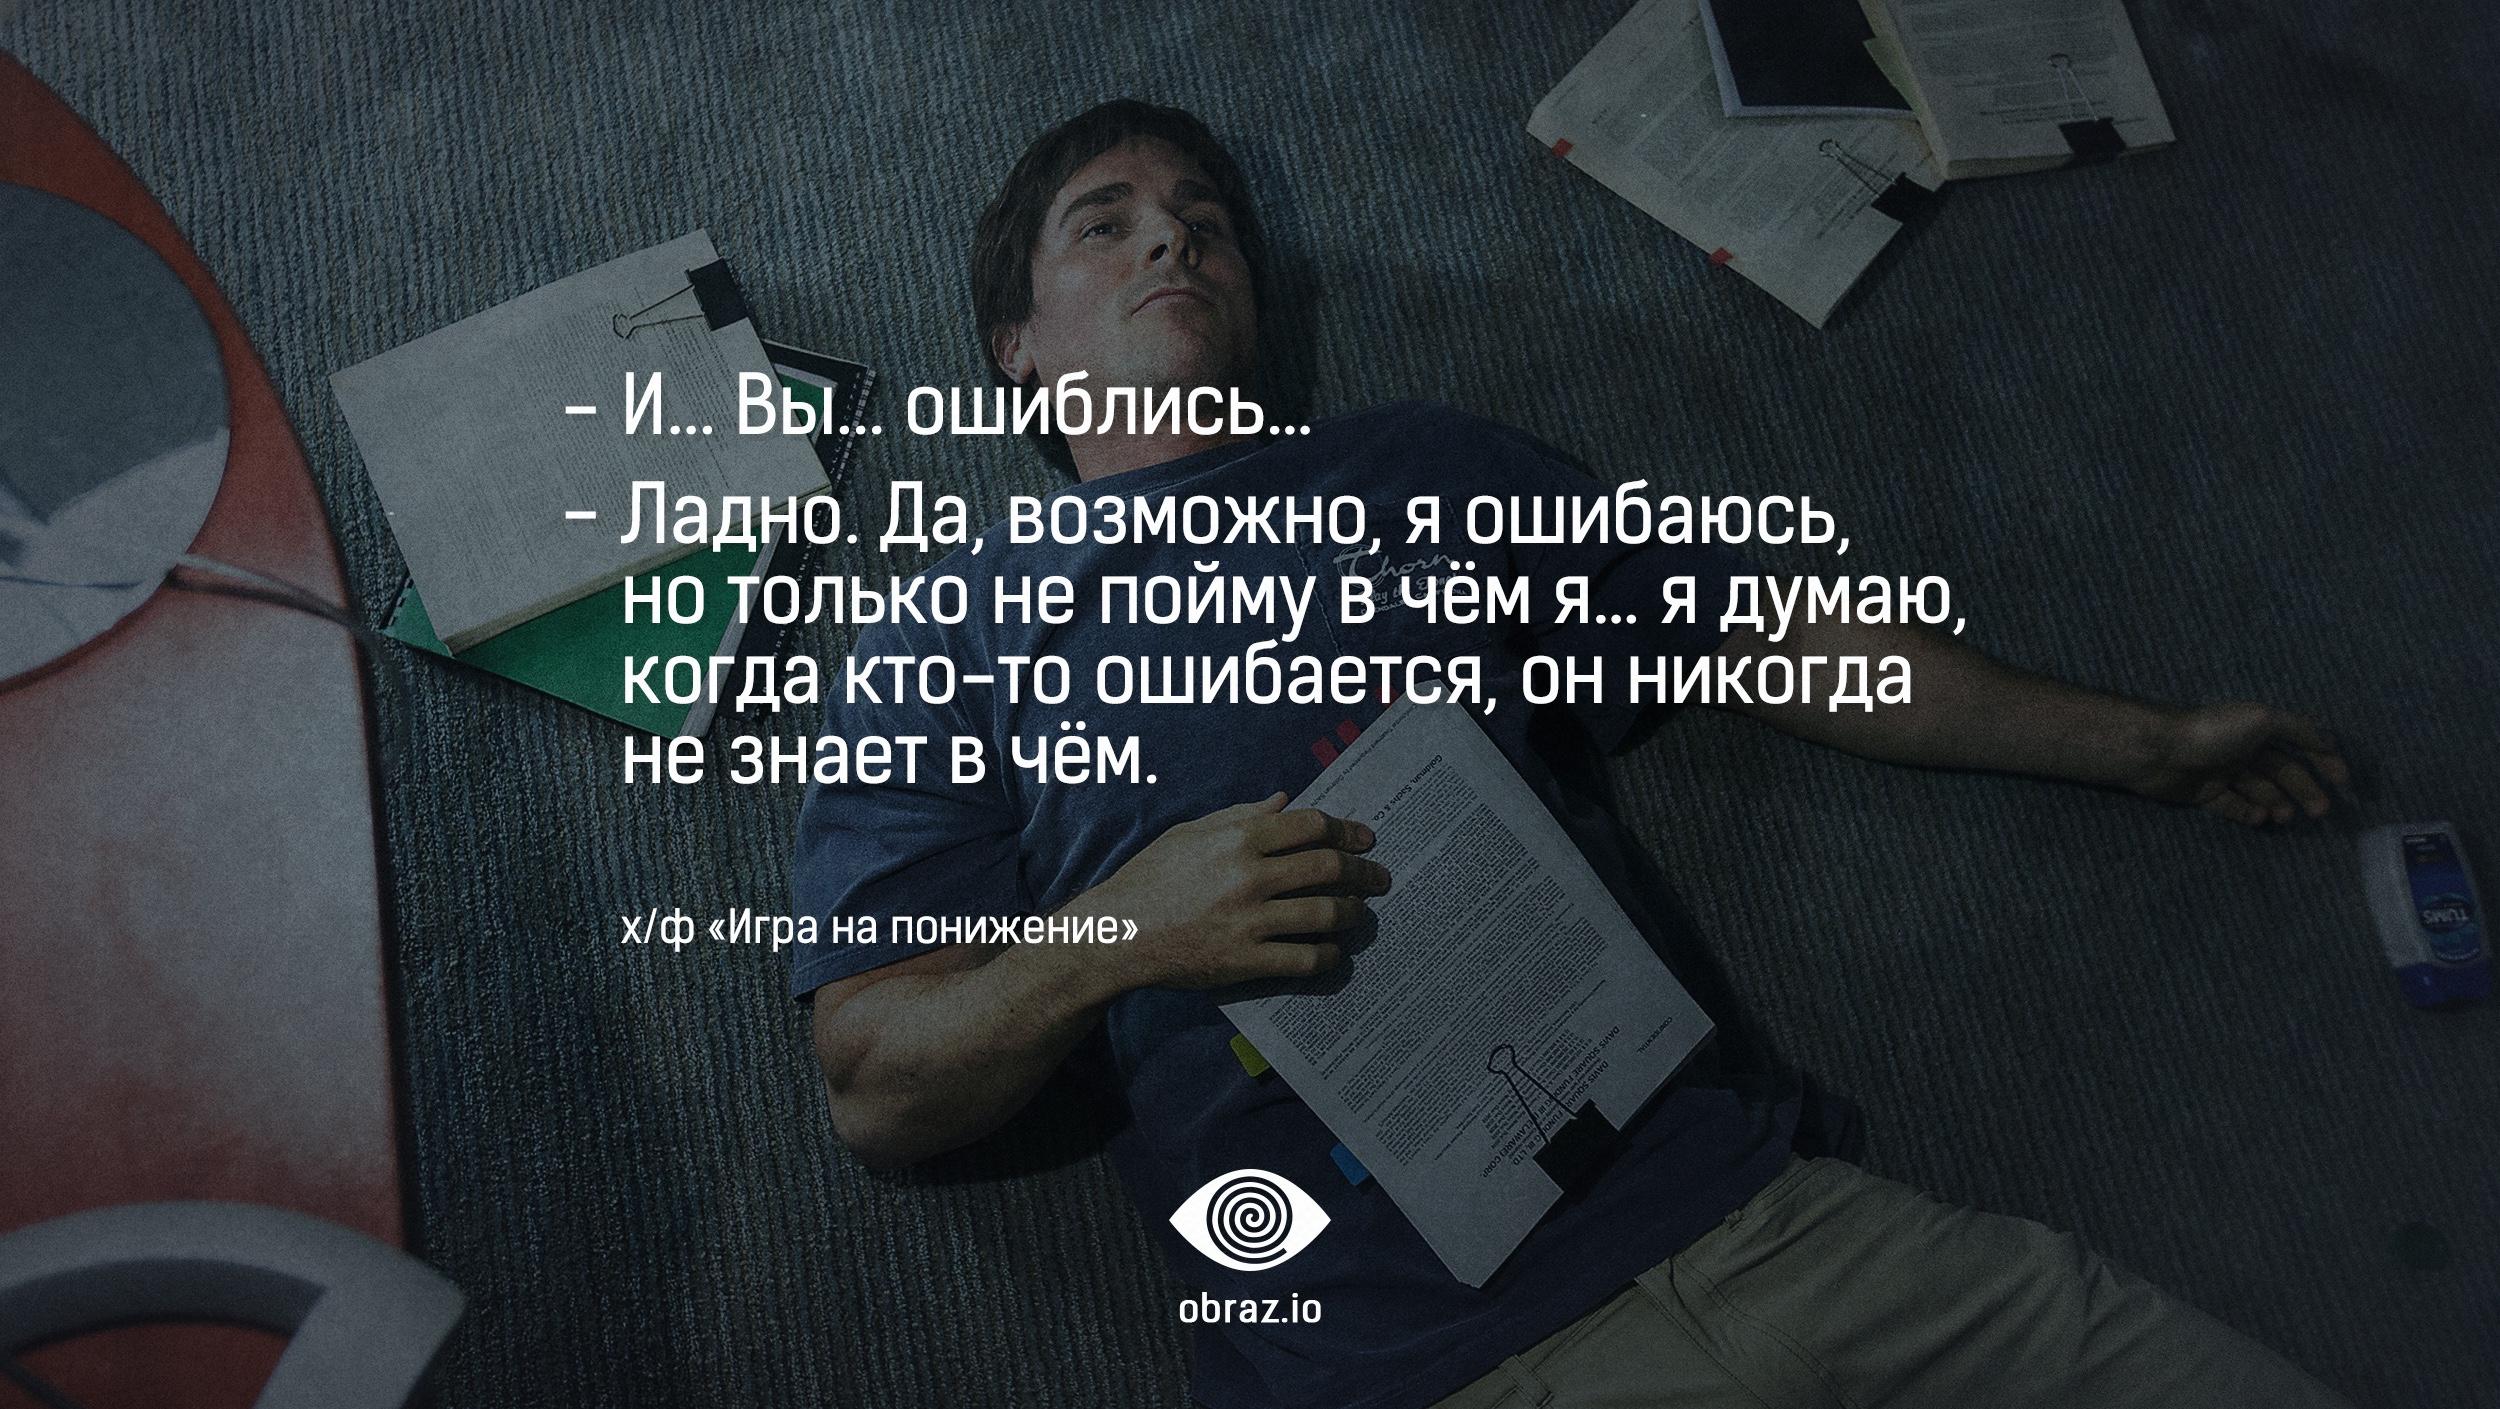 Email:learningkurakov@gmail com3292 tn9xia.ajla24kj4i